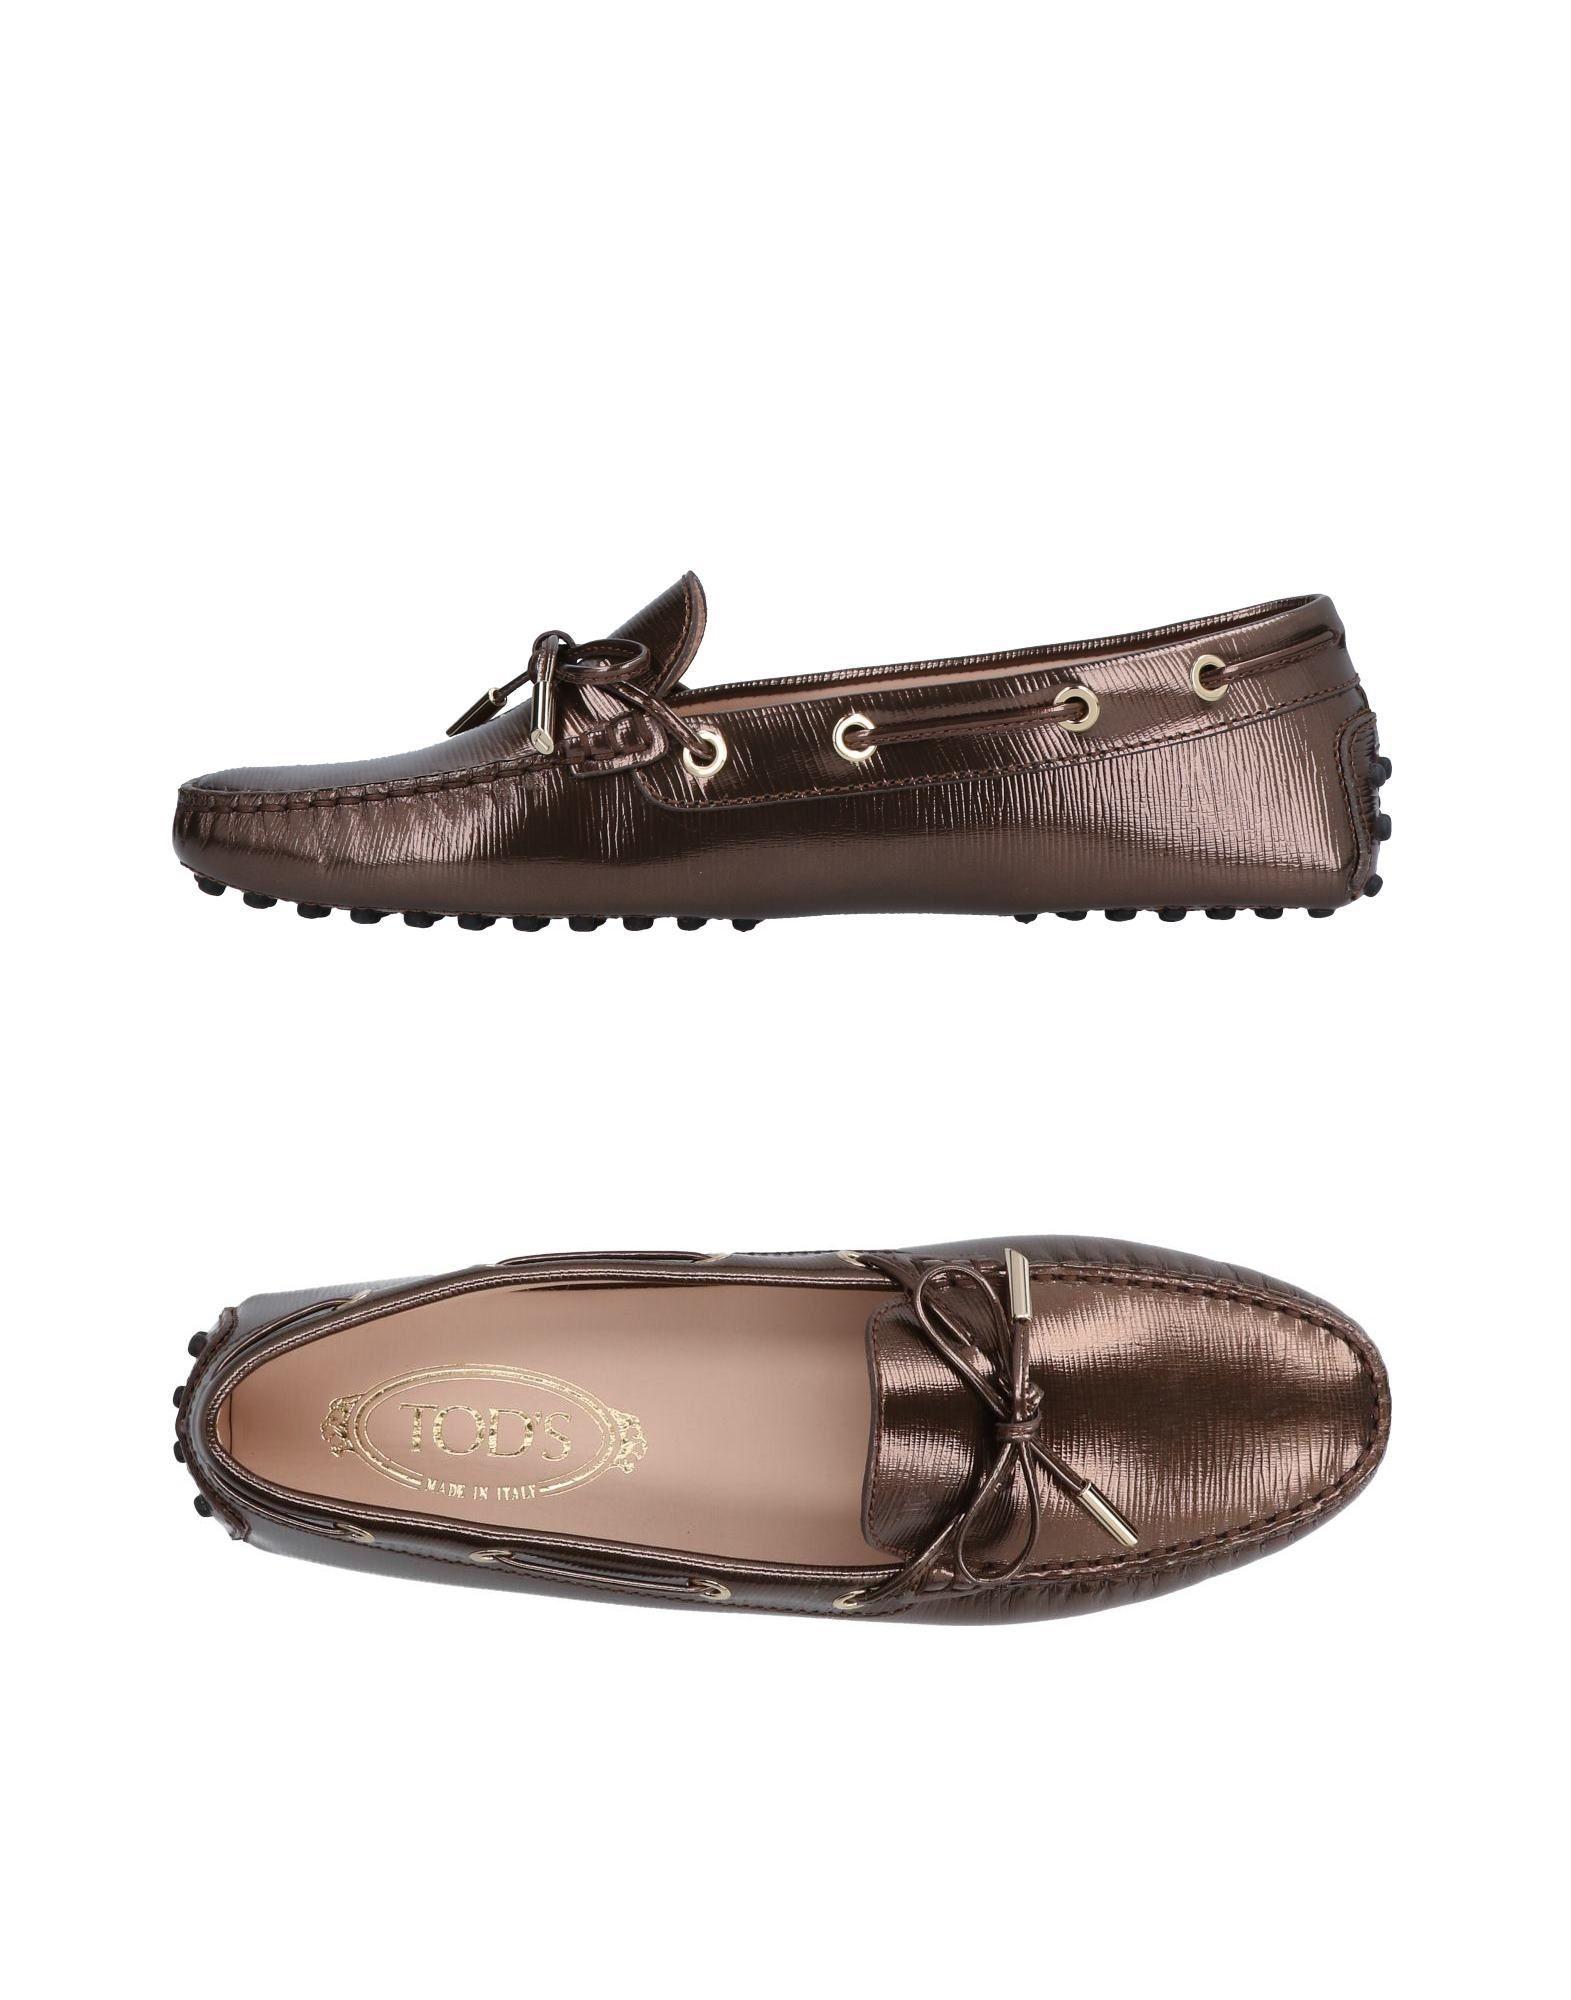 Rabatt Tod's Schuhe Tod's Rabatt Mokassins Damen  11484630BK 6517f3